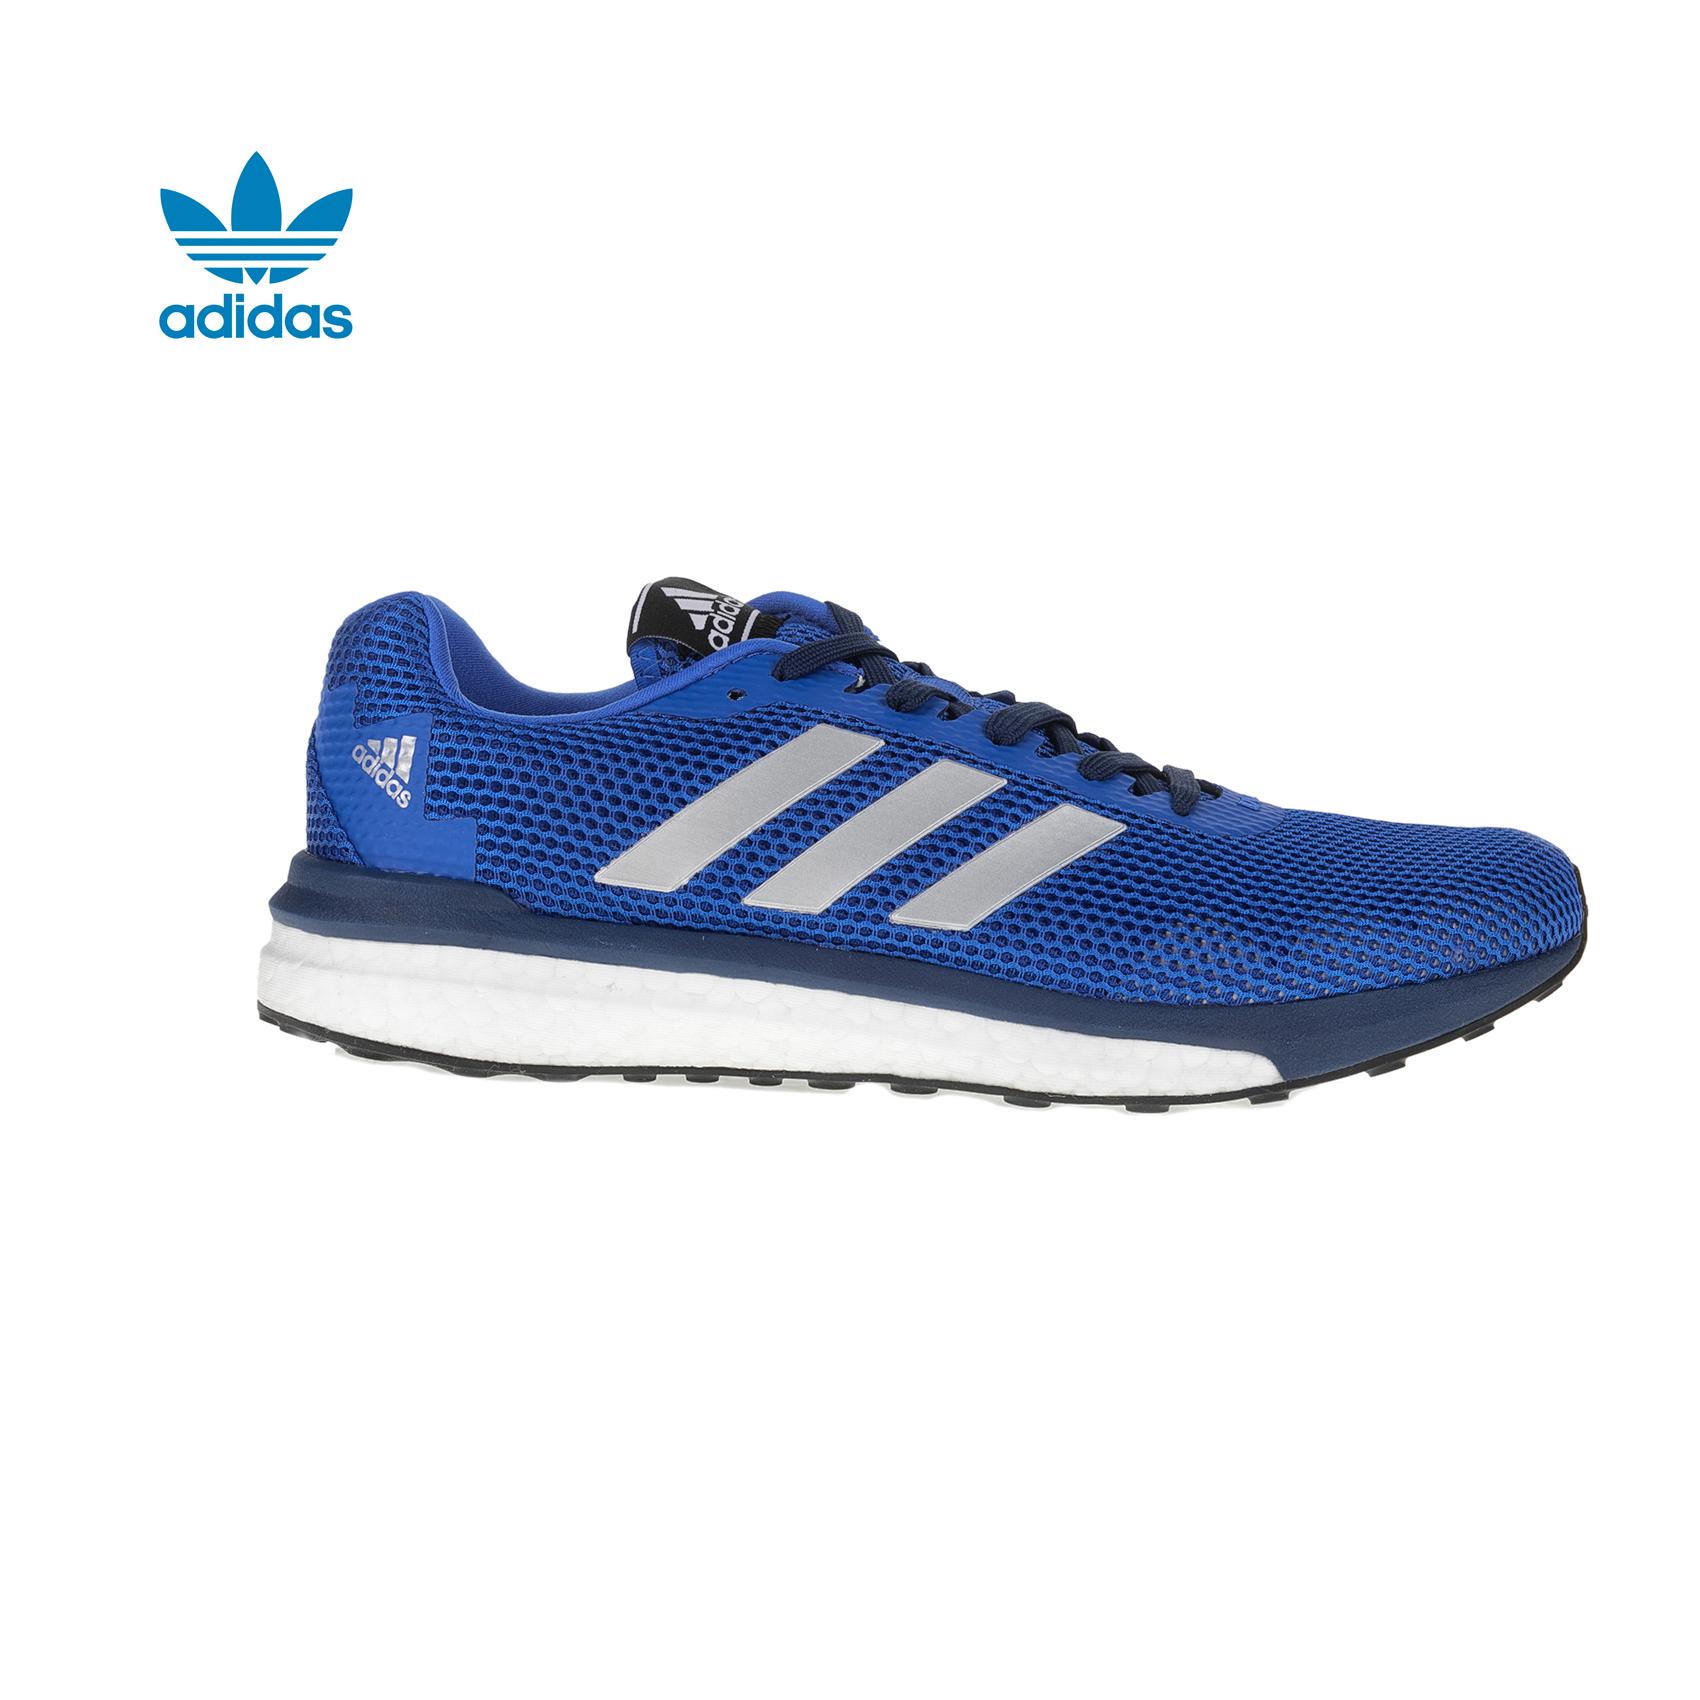 adidas Originals – Ανδρικά παπούτσια adidas vengeful μπλε